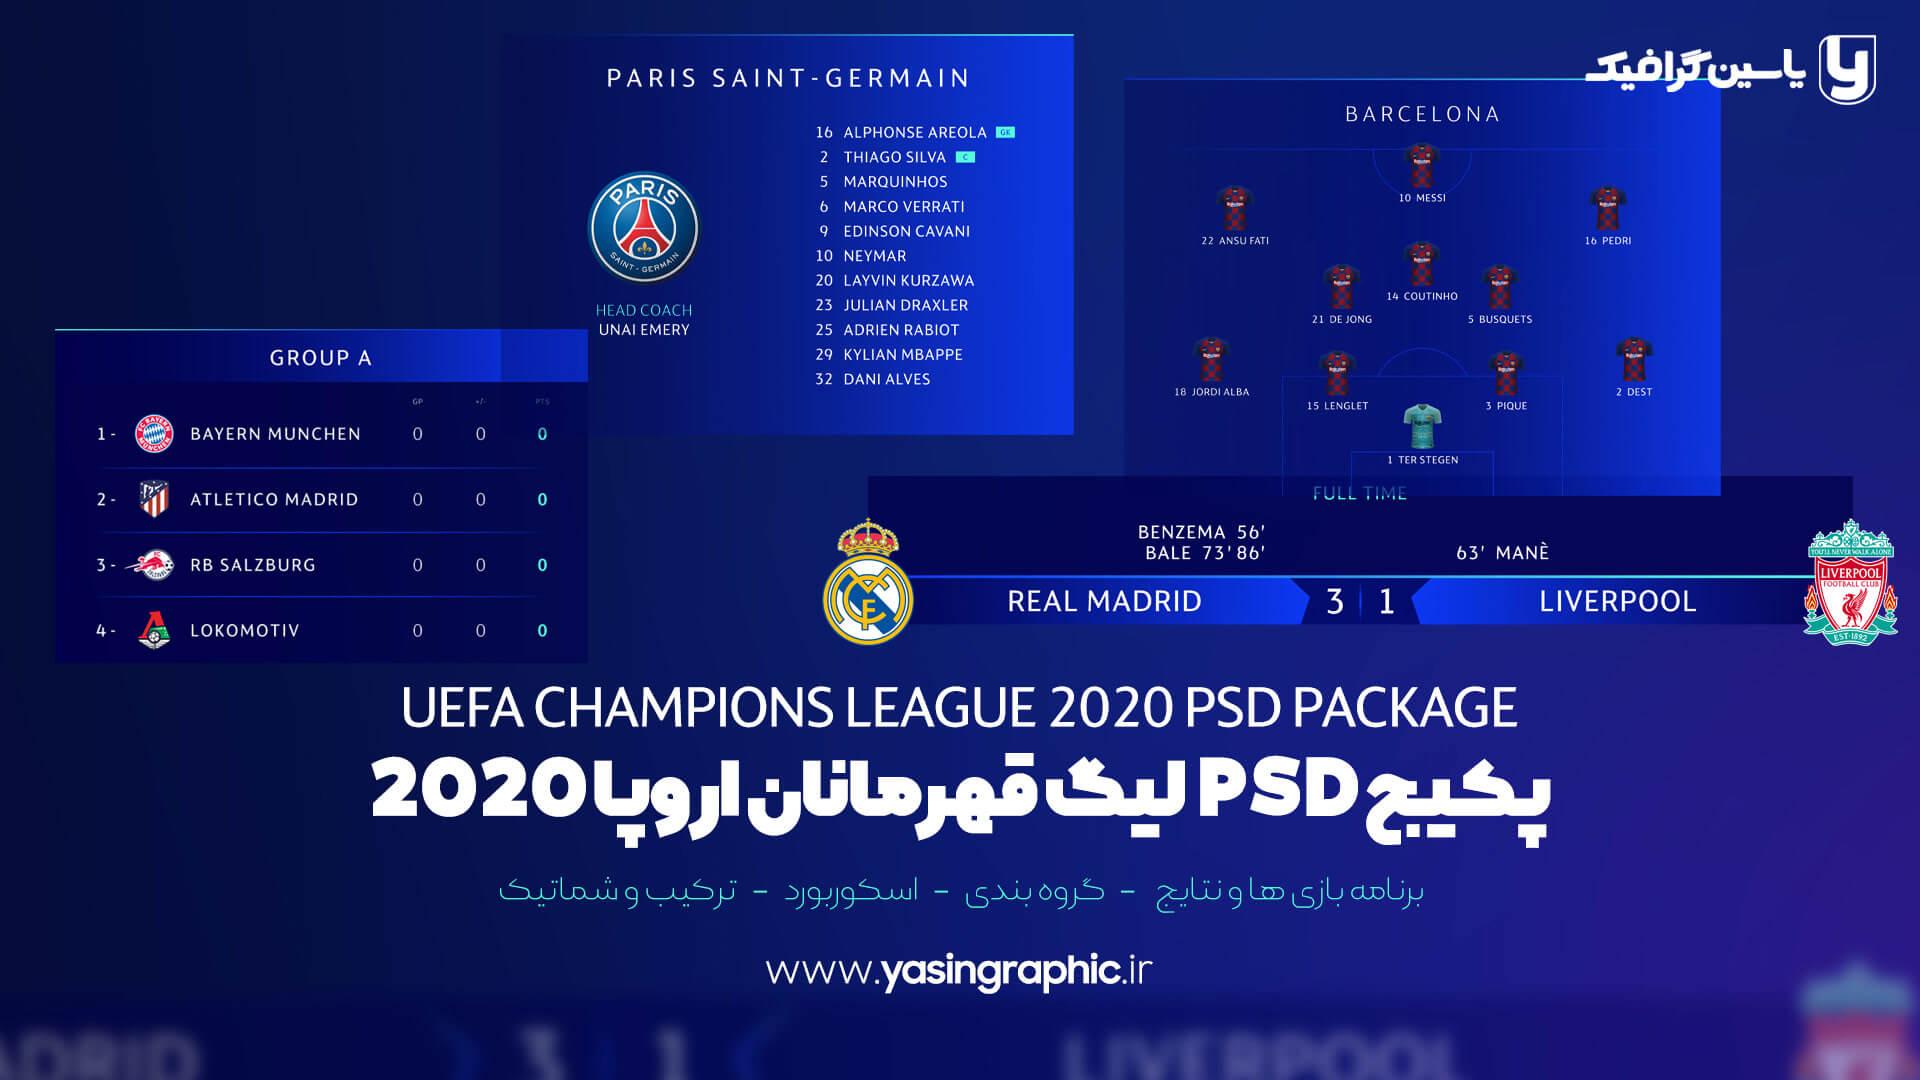 پکیج PSD لیگ قهرمانان اروپا 2020